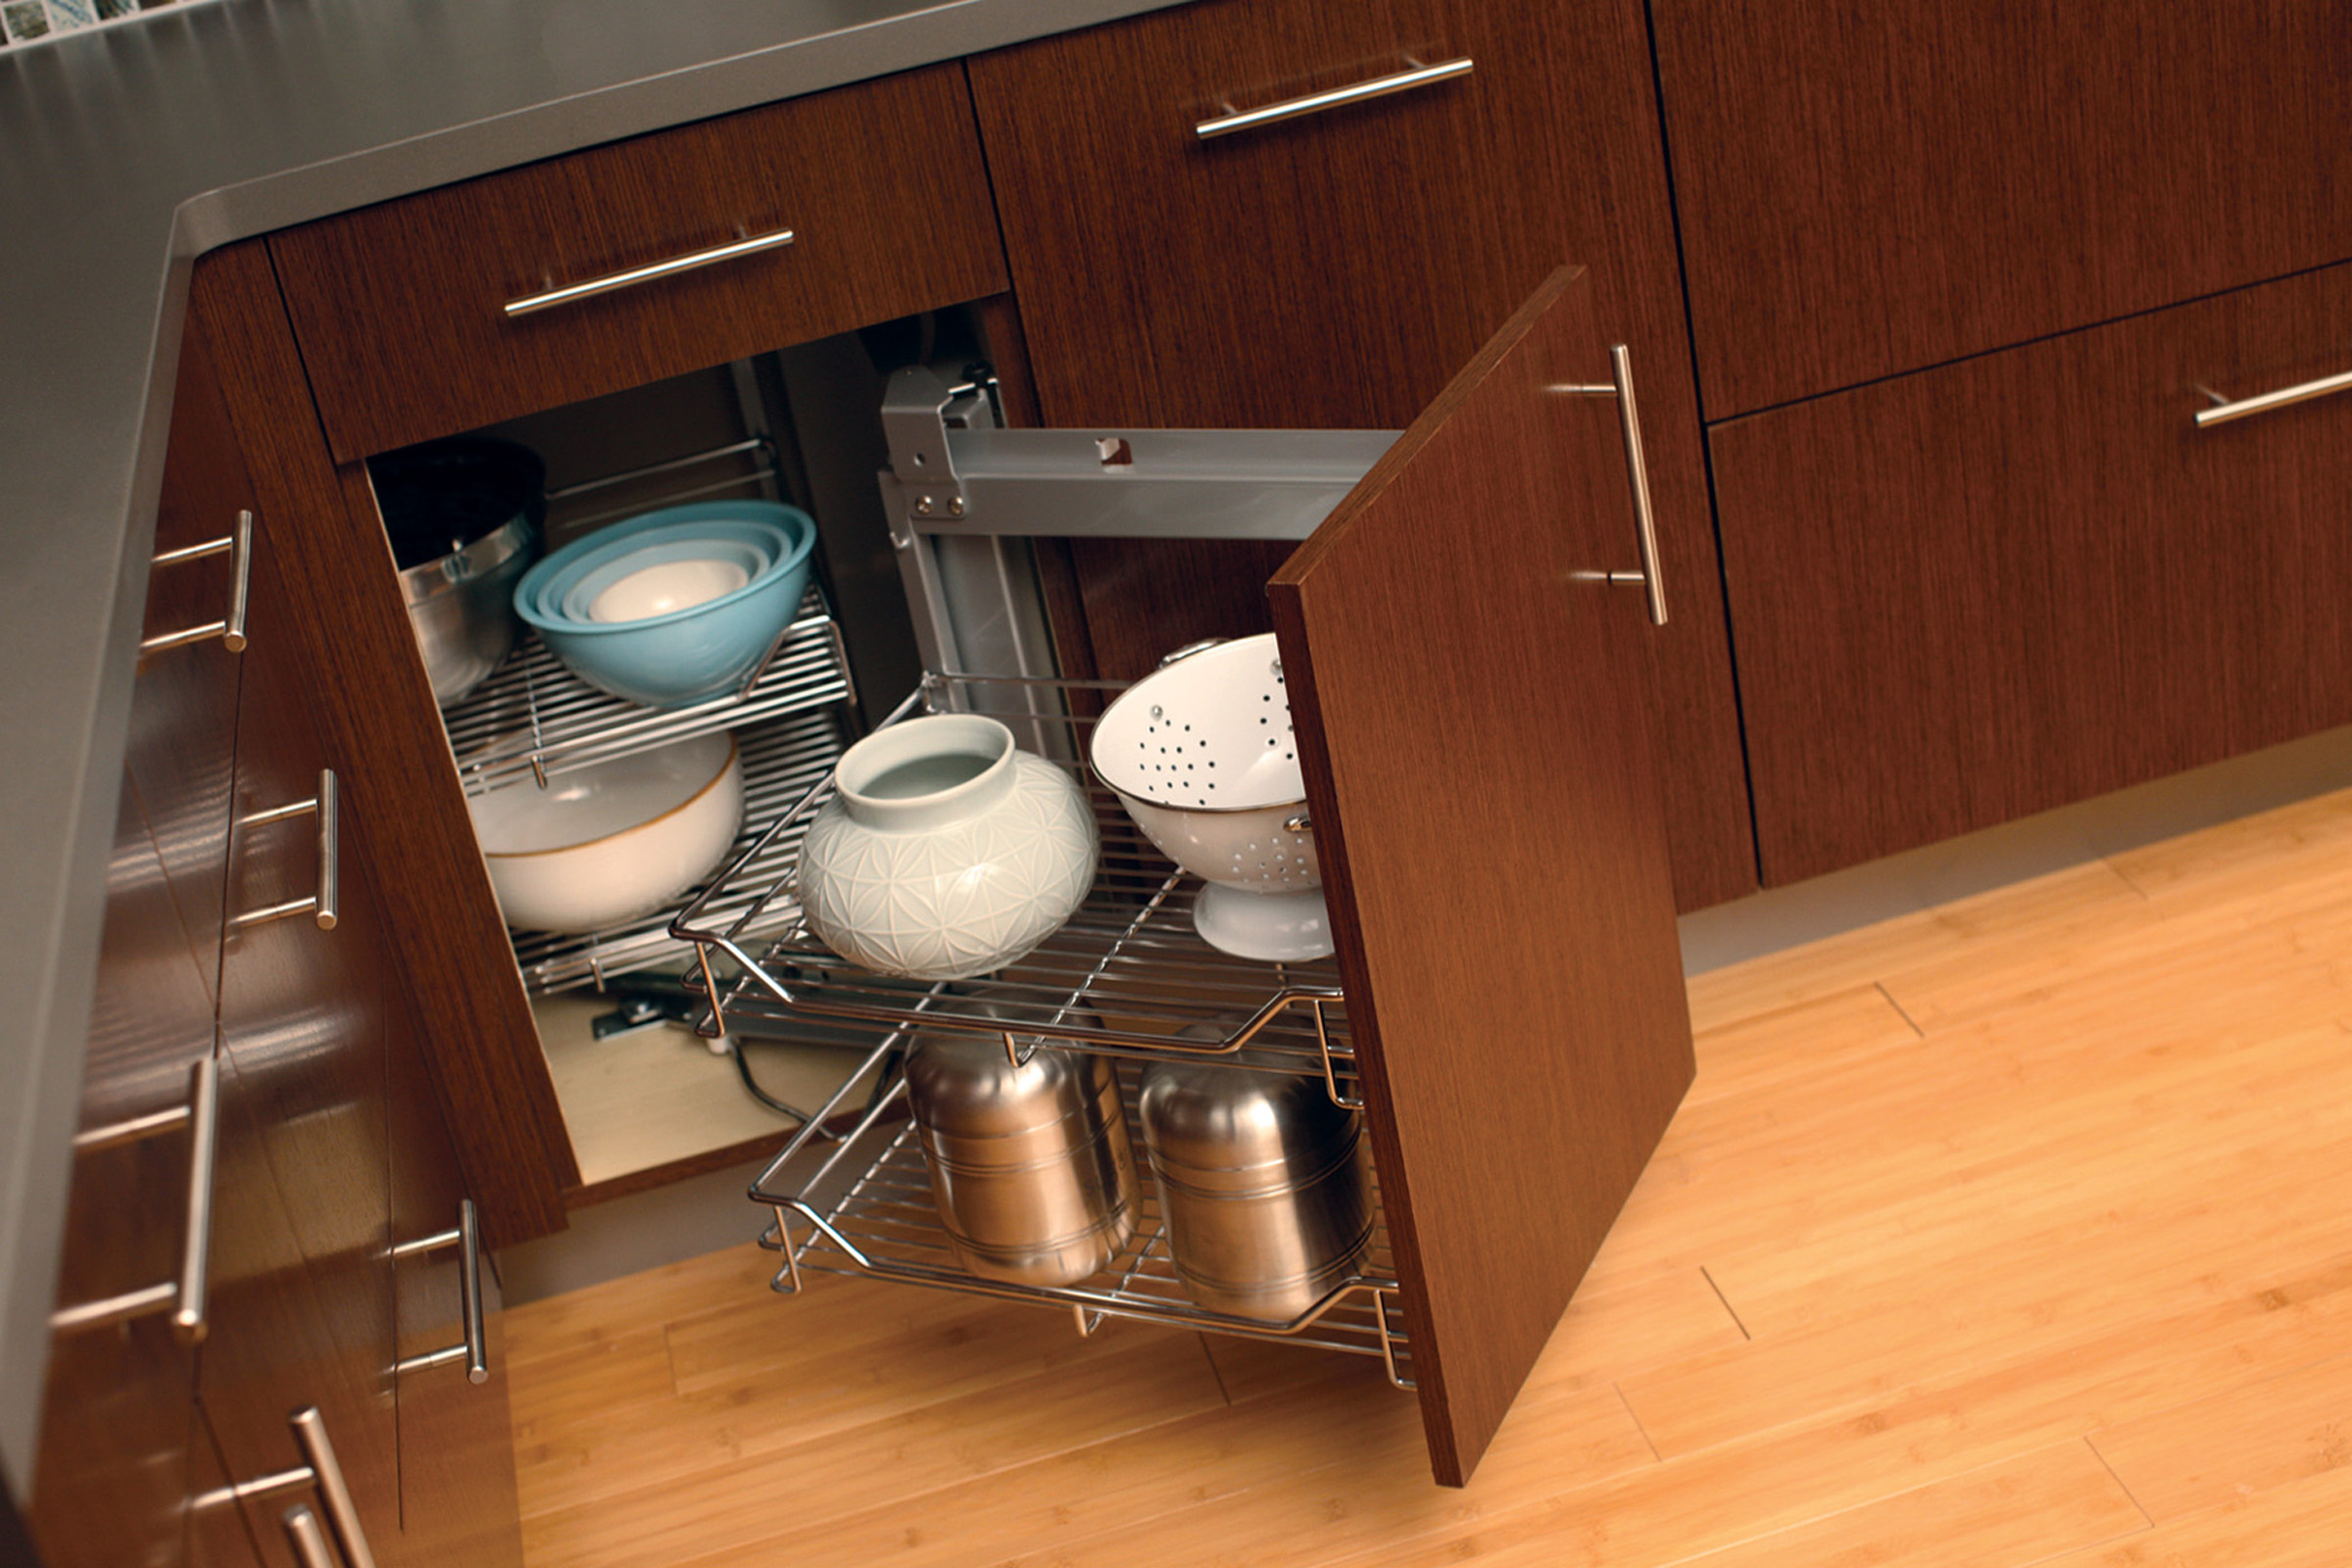 Dura Supreme Swing-out basket storage for corner cabinets.